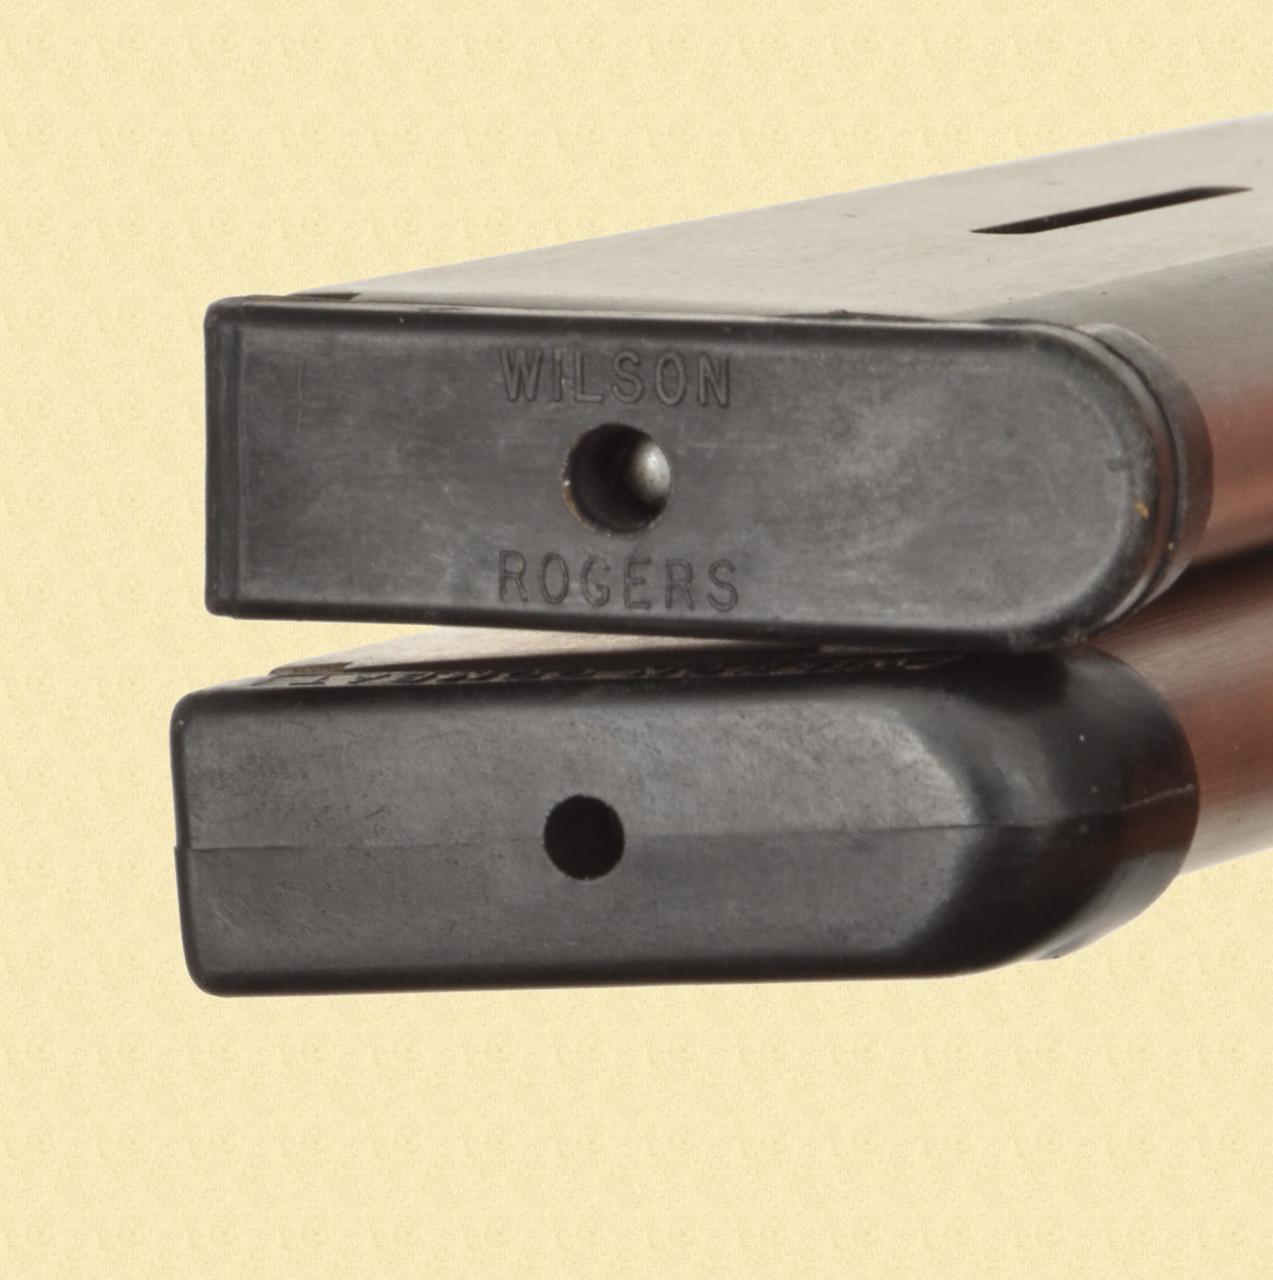 WILSON STAINLESS STEEL .45 MAGAZINES - C47227